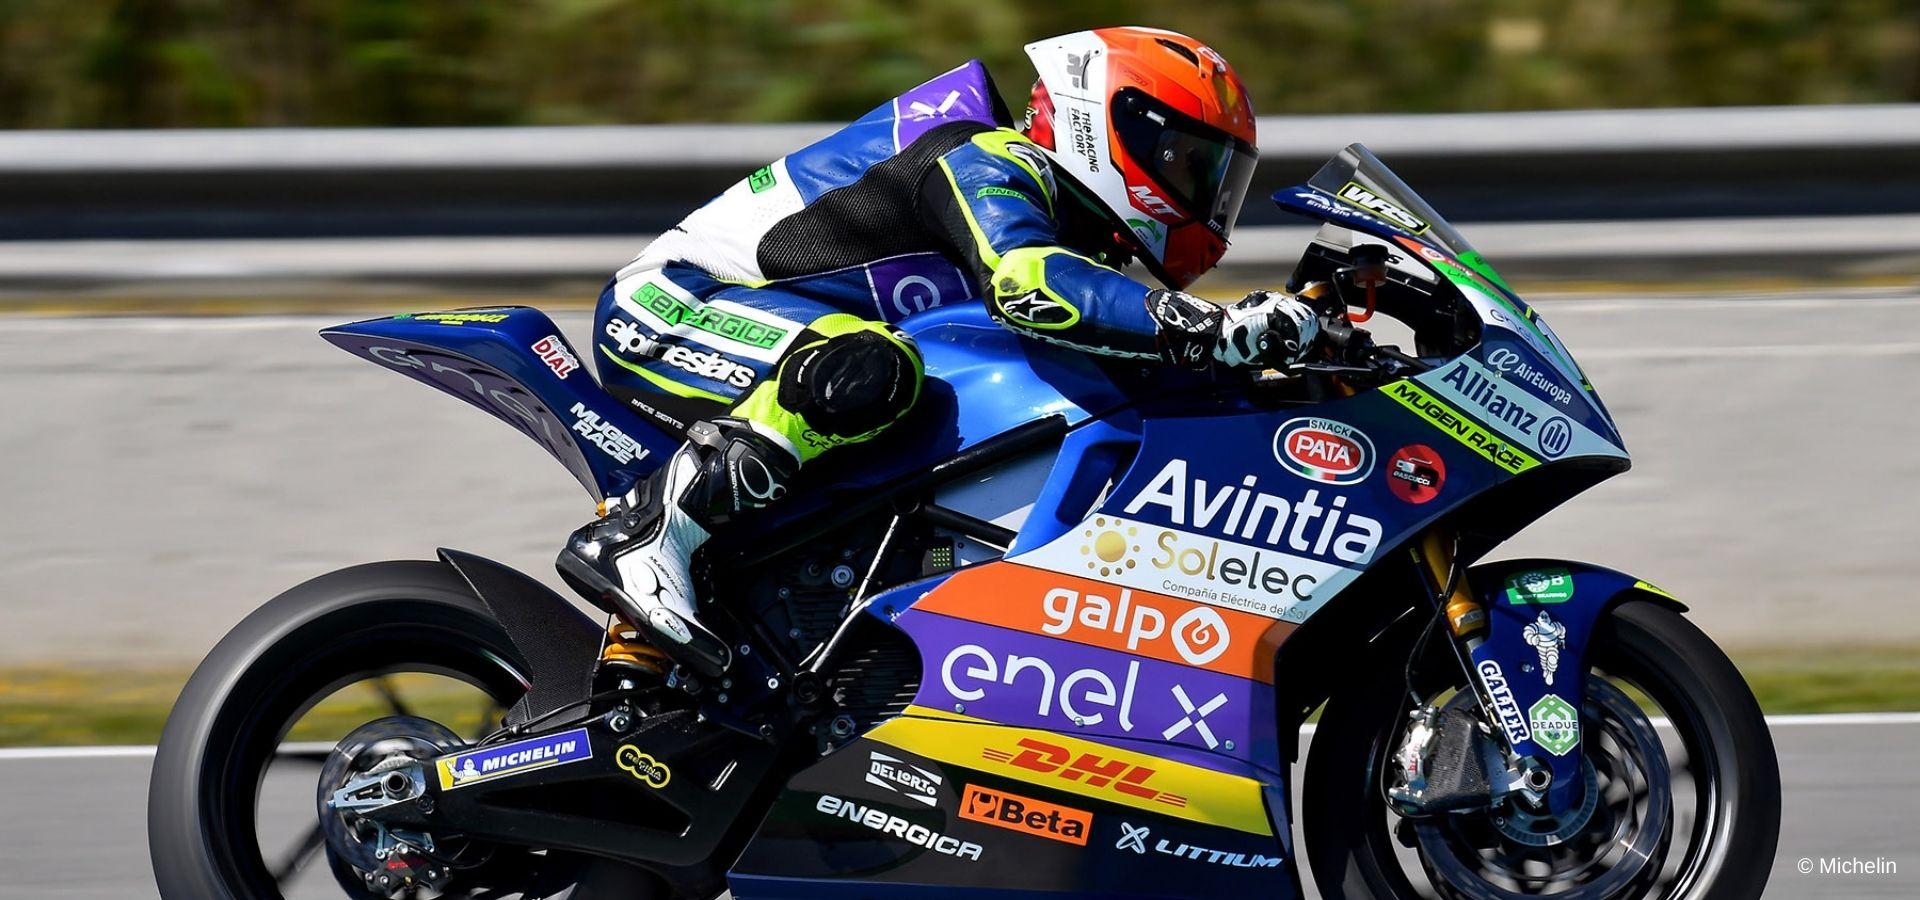 Poin pertama masuk MotoE untuk Pires sementara Cardelus jatuh di tengah perlombaan